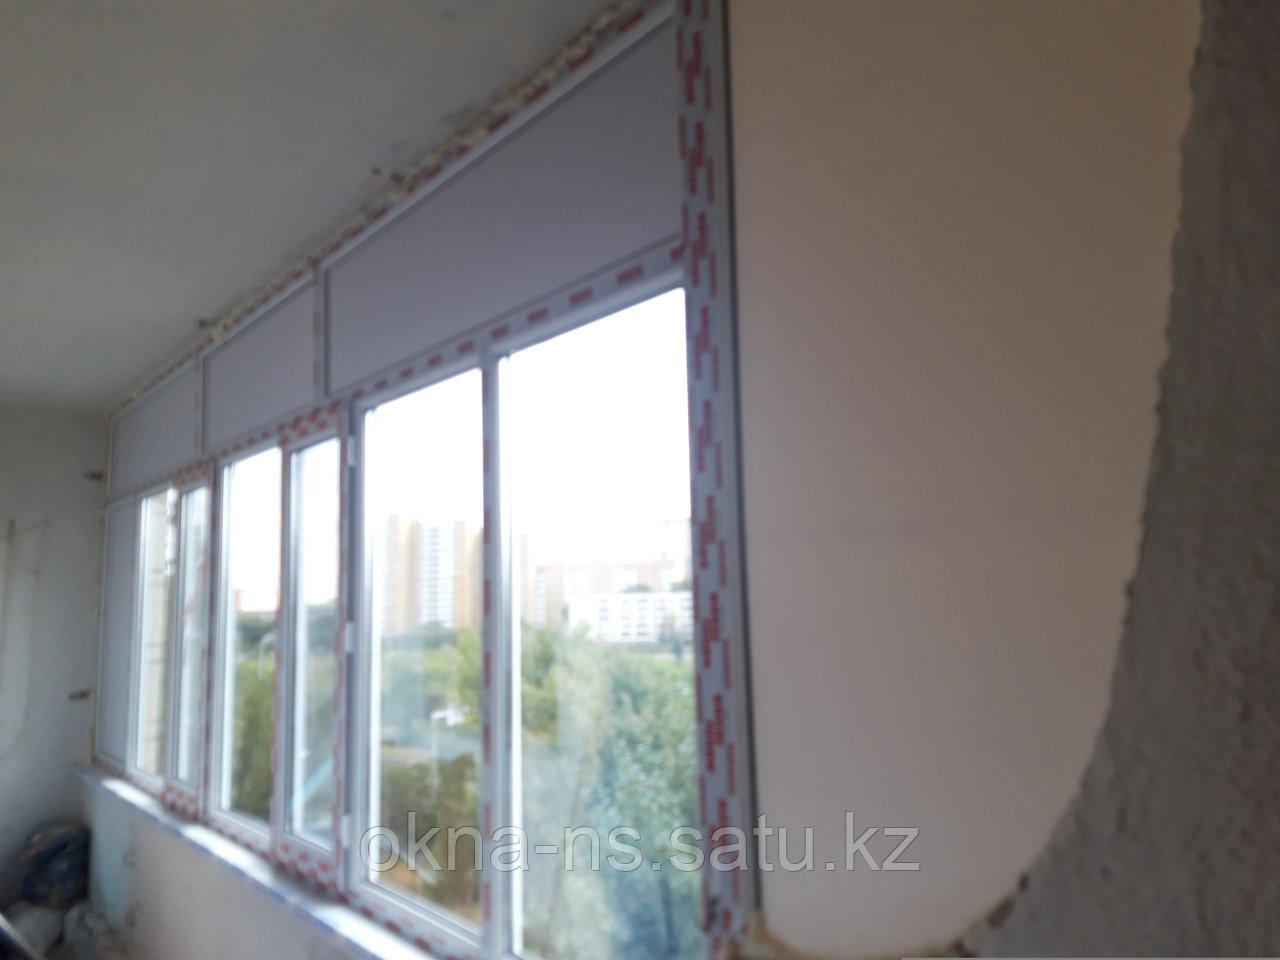 Пластиковые окна Астана - фото 1